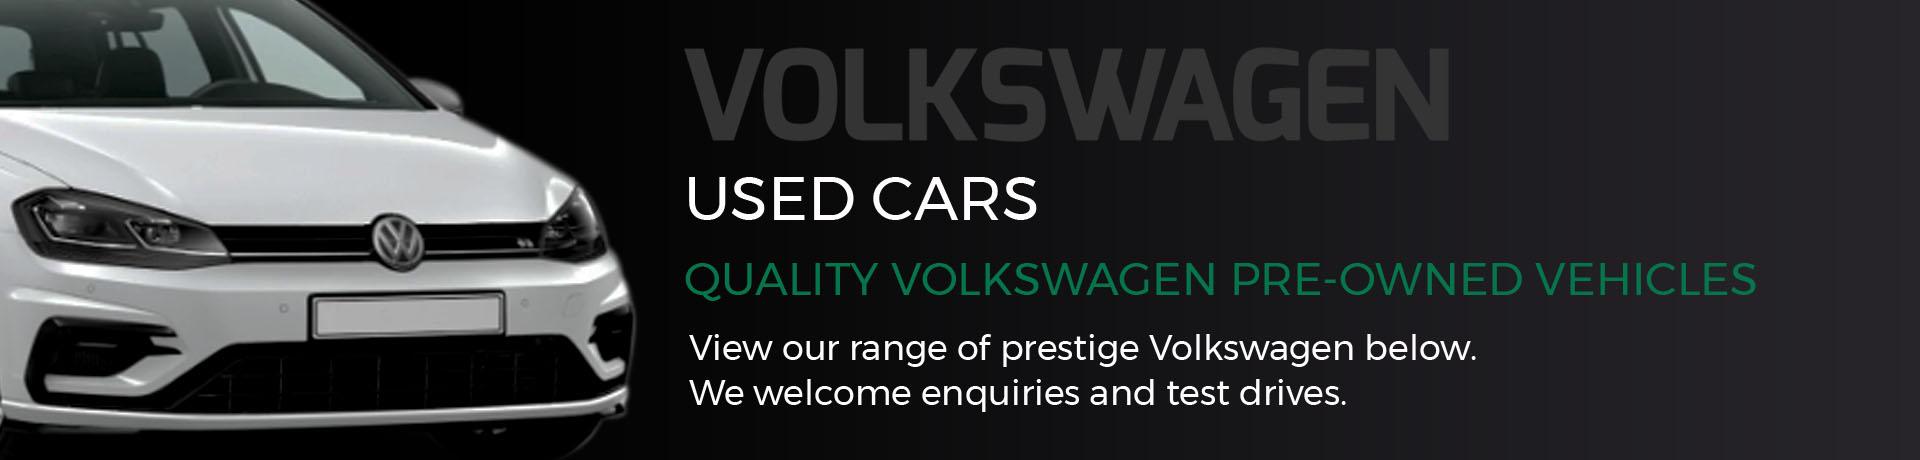 Volkswagen used cars adelaide